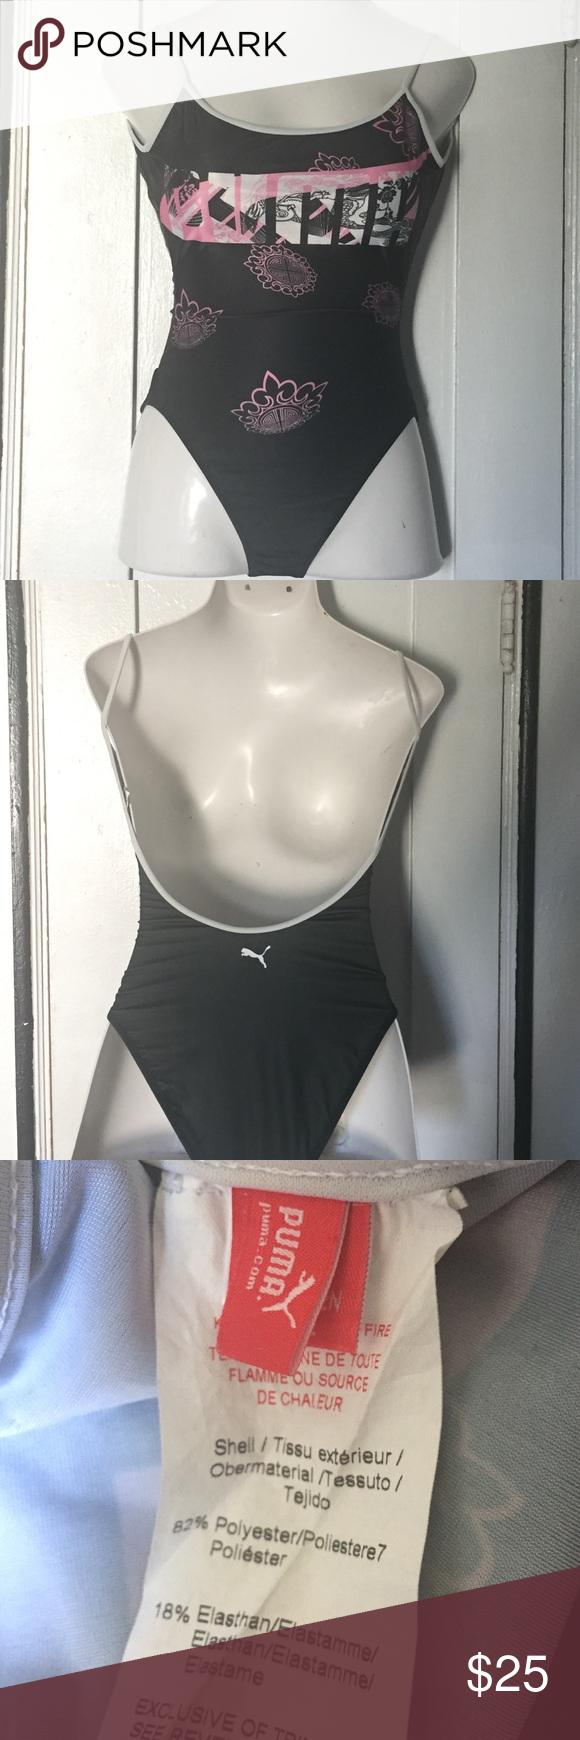 Puma One Piece Open Back Bathing Suit Size Medium My Posh Picks